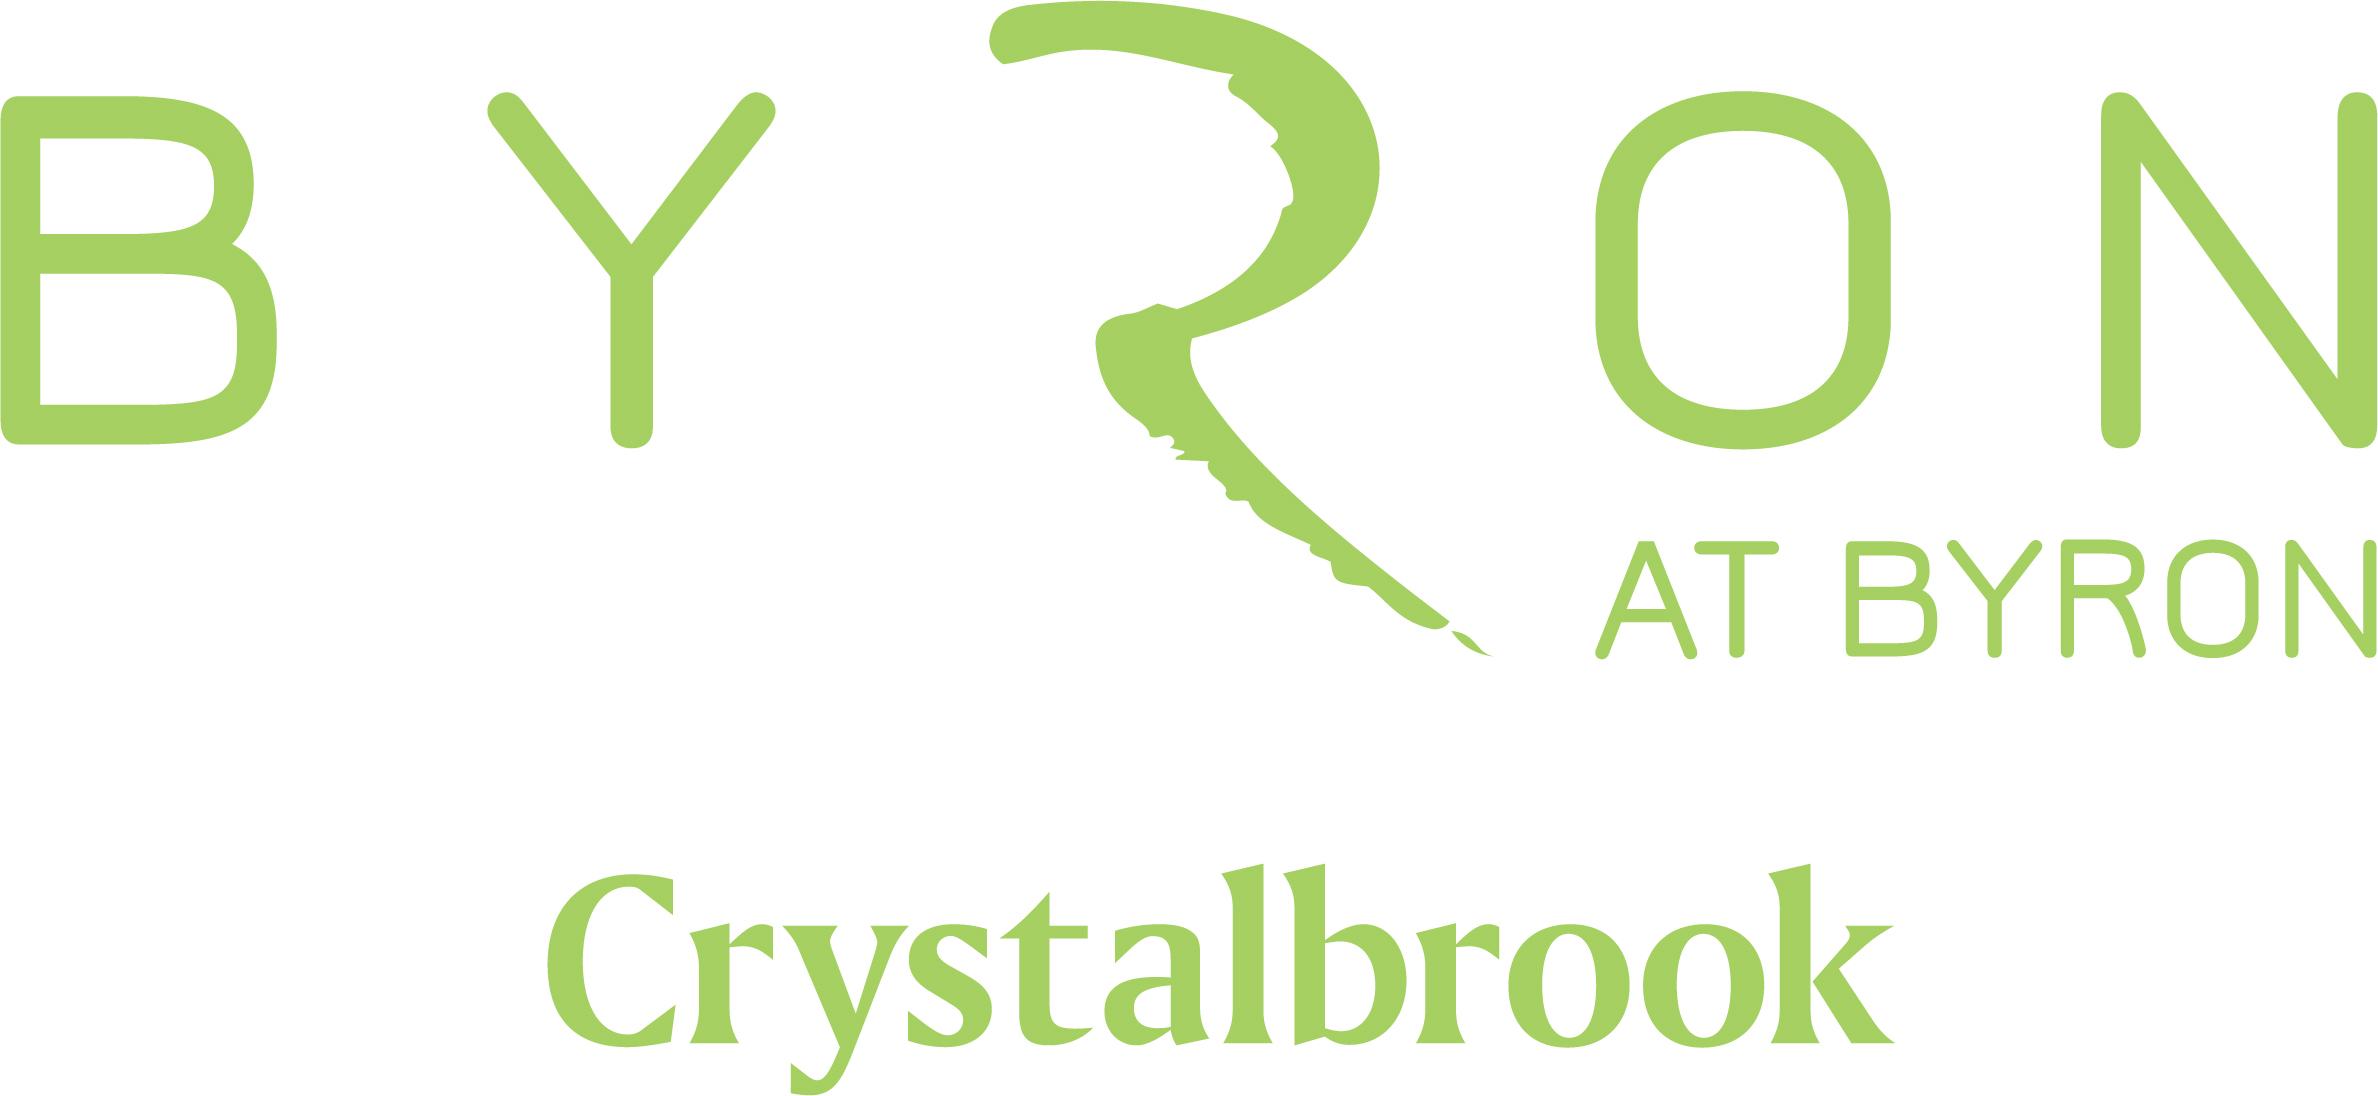 https://byronwritersfestival.com/wp-content/uploads/2021/03/Byron-Lime-Green-RGB.jpg